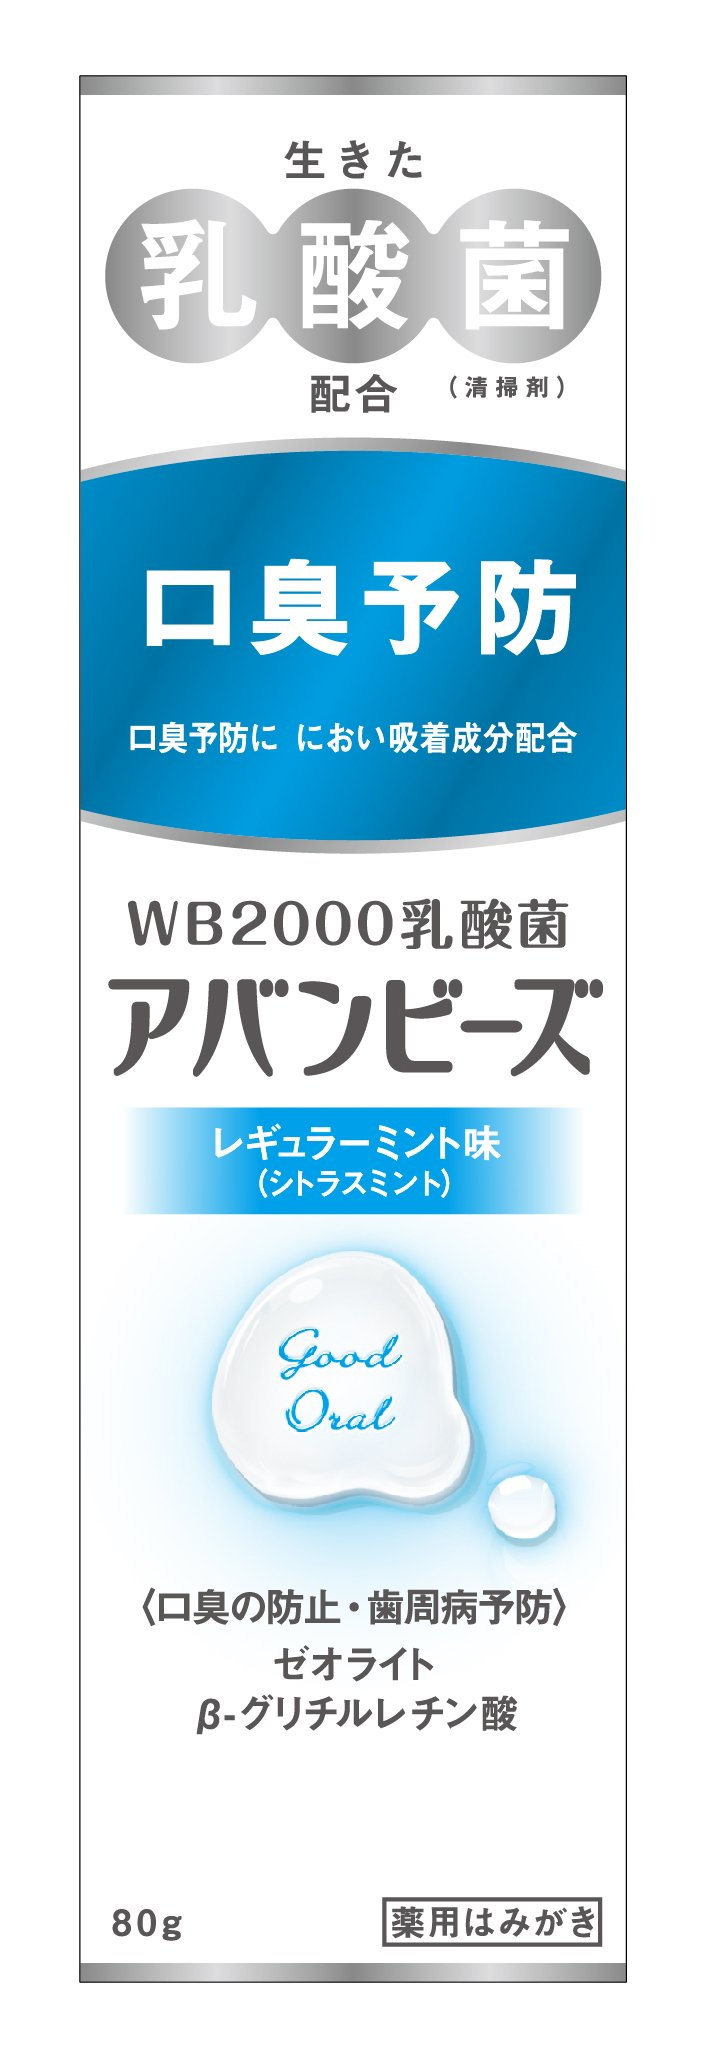 Wakamoto Pharmacy Avantbise 80g Toothpaste 1 Count Regular Mint